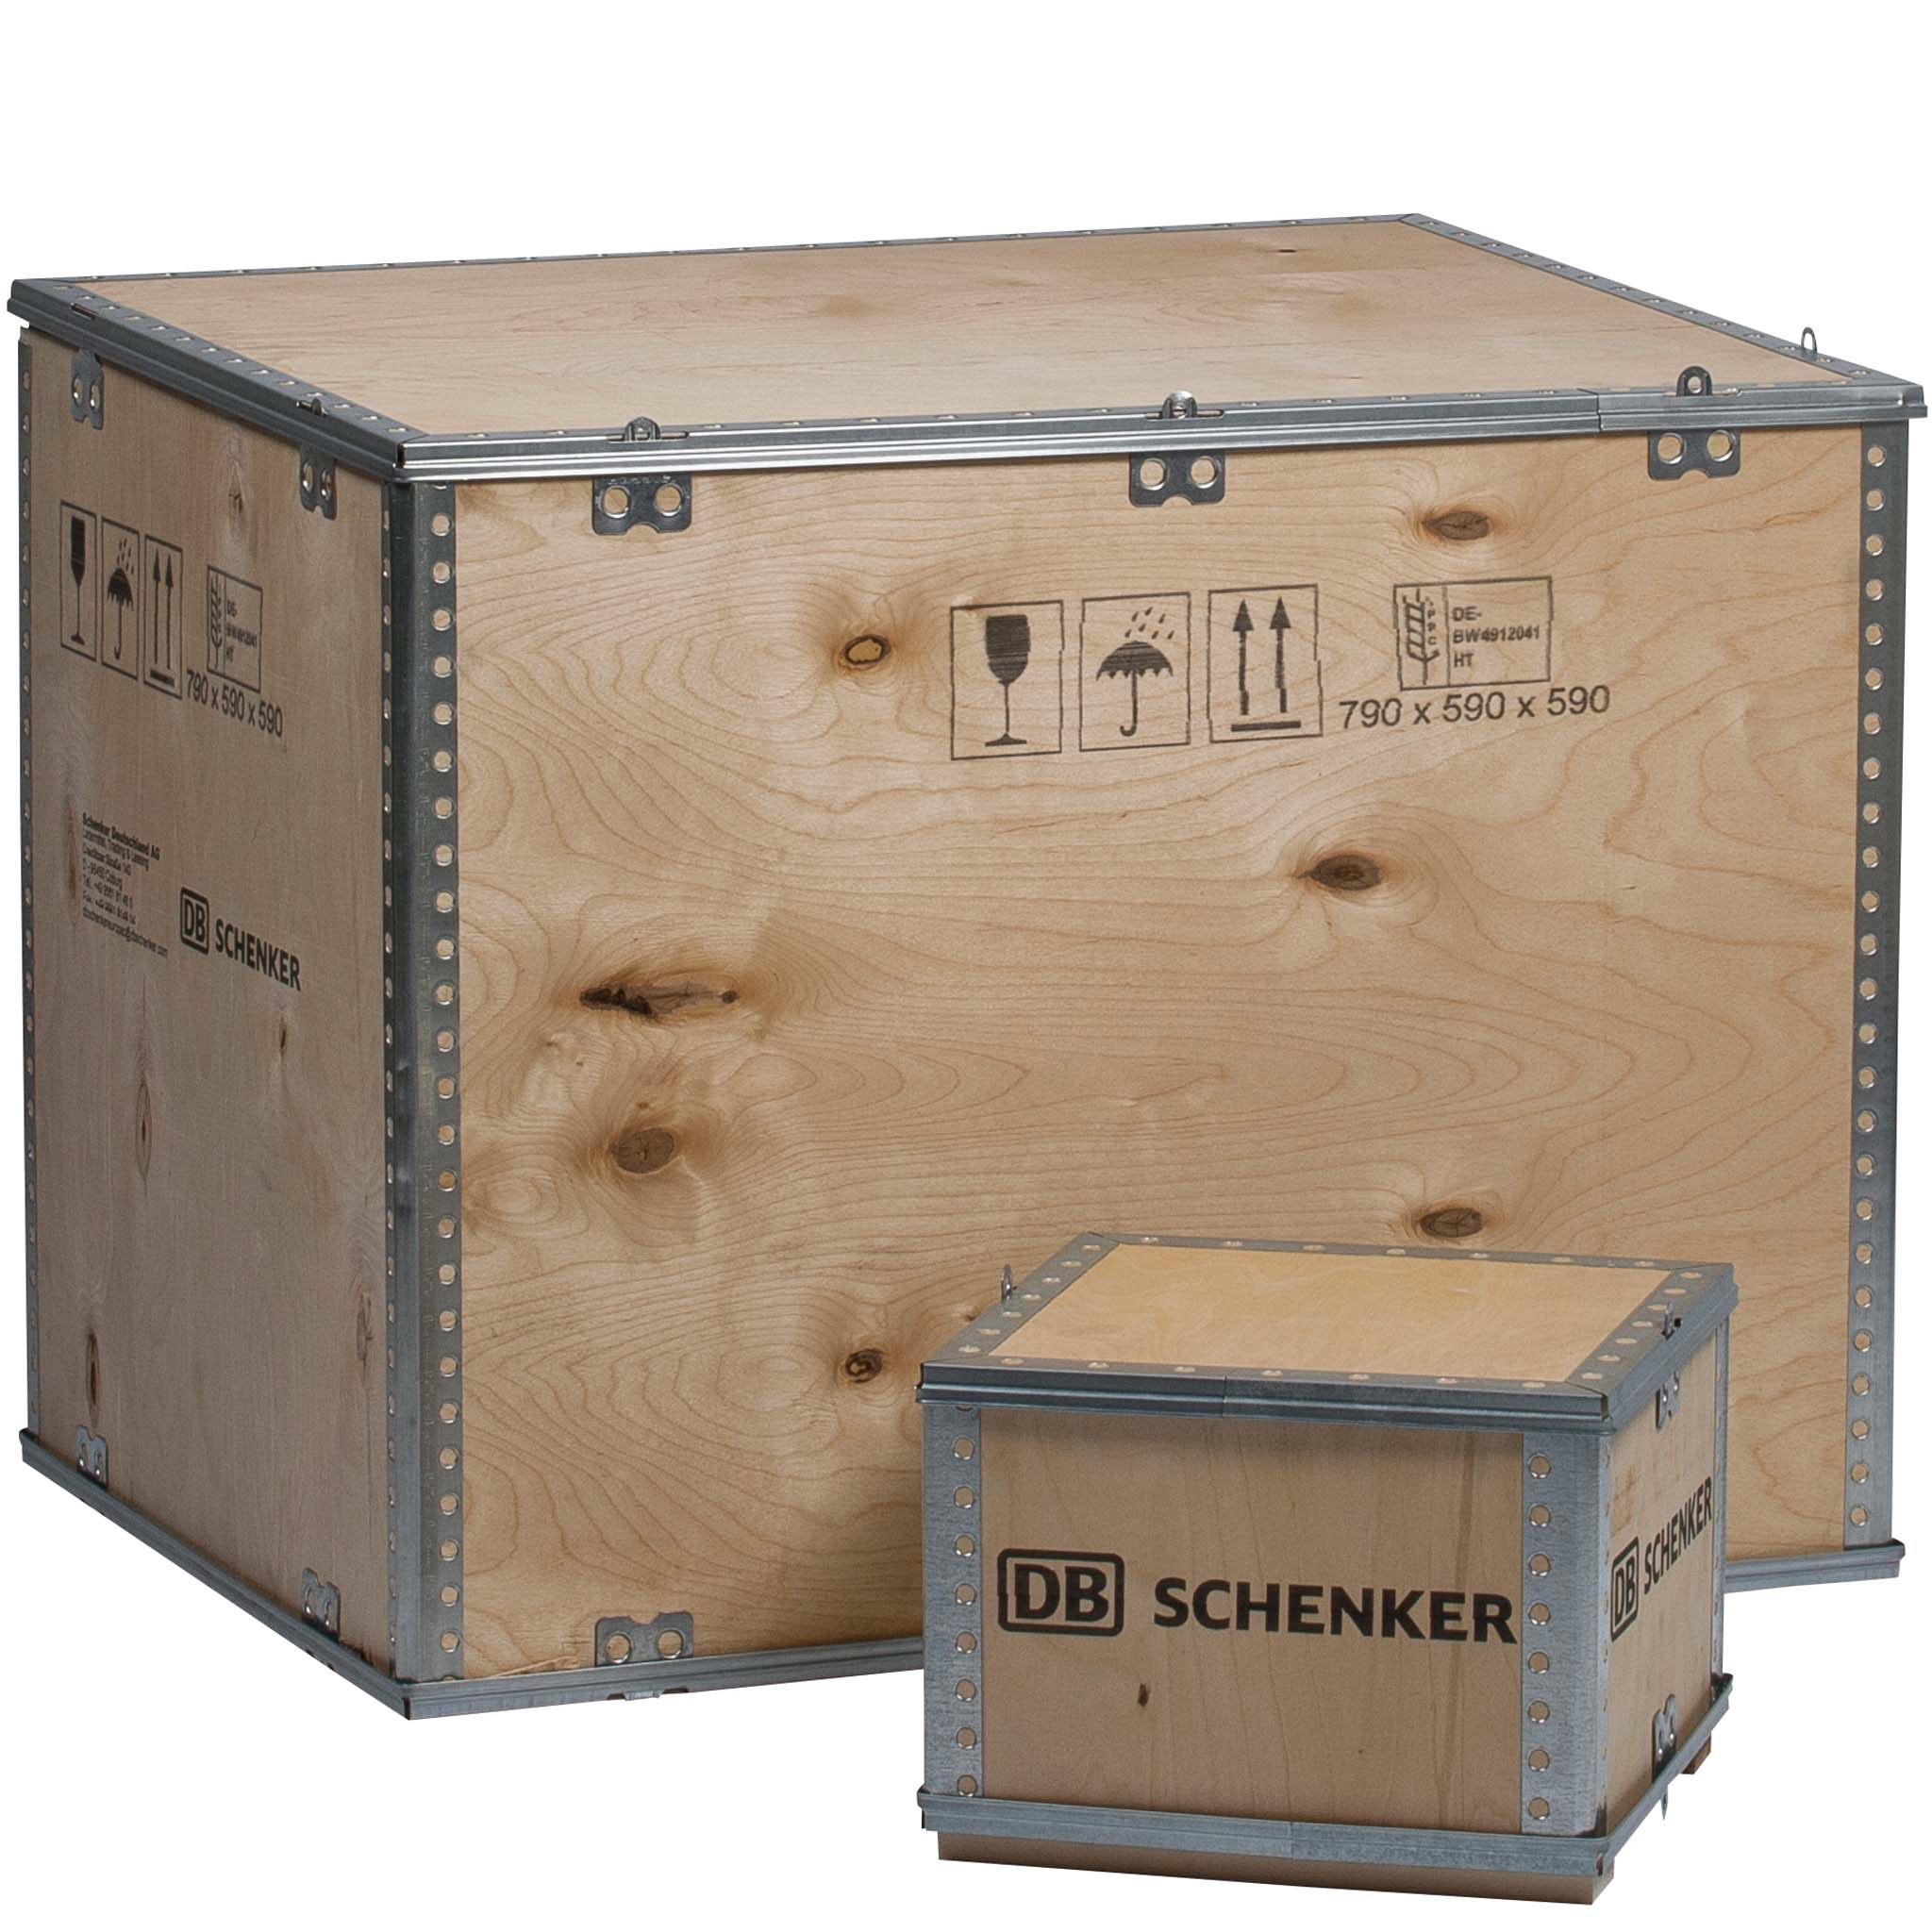 Cargo Boxen | 600 X 400 mm | ohne Palettenunterbau Innenmaß 590 x 390 x 260 mm